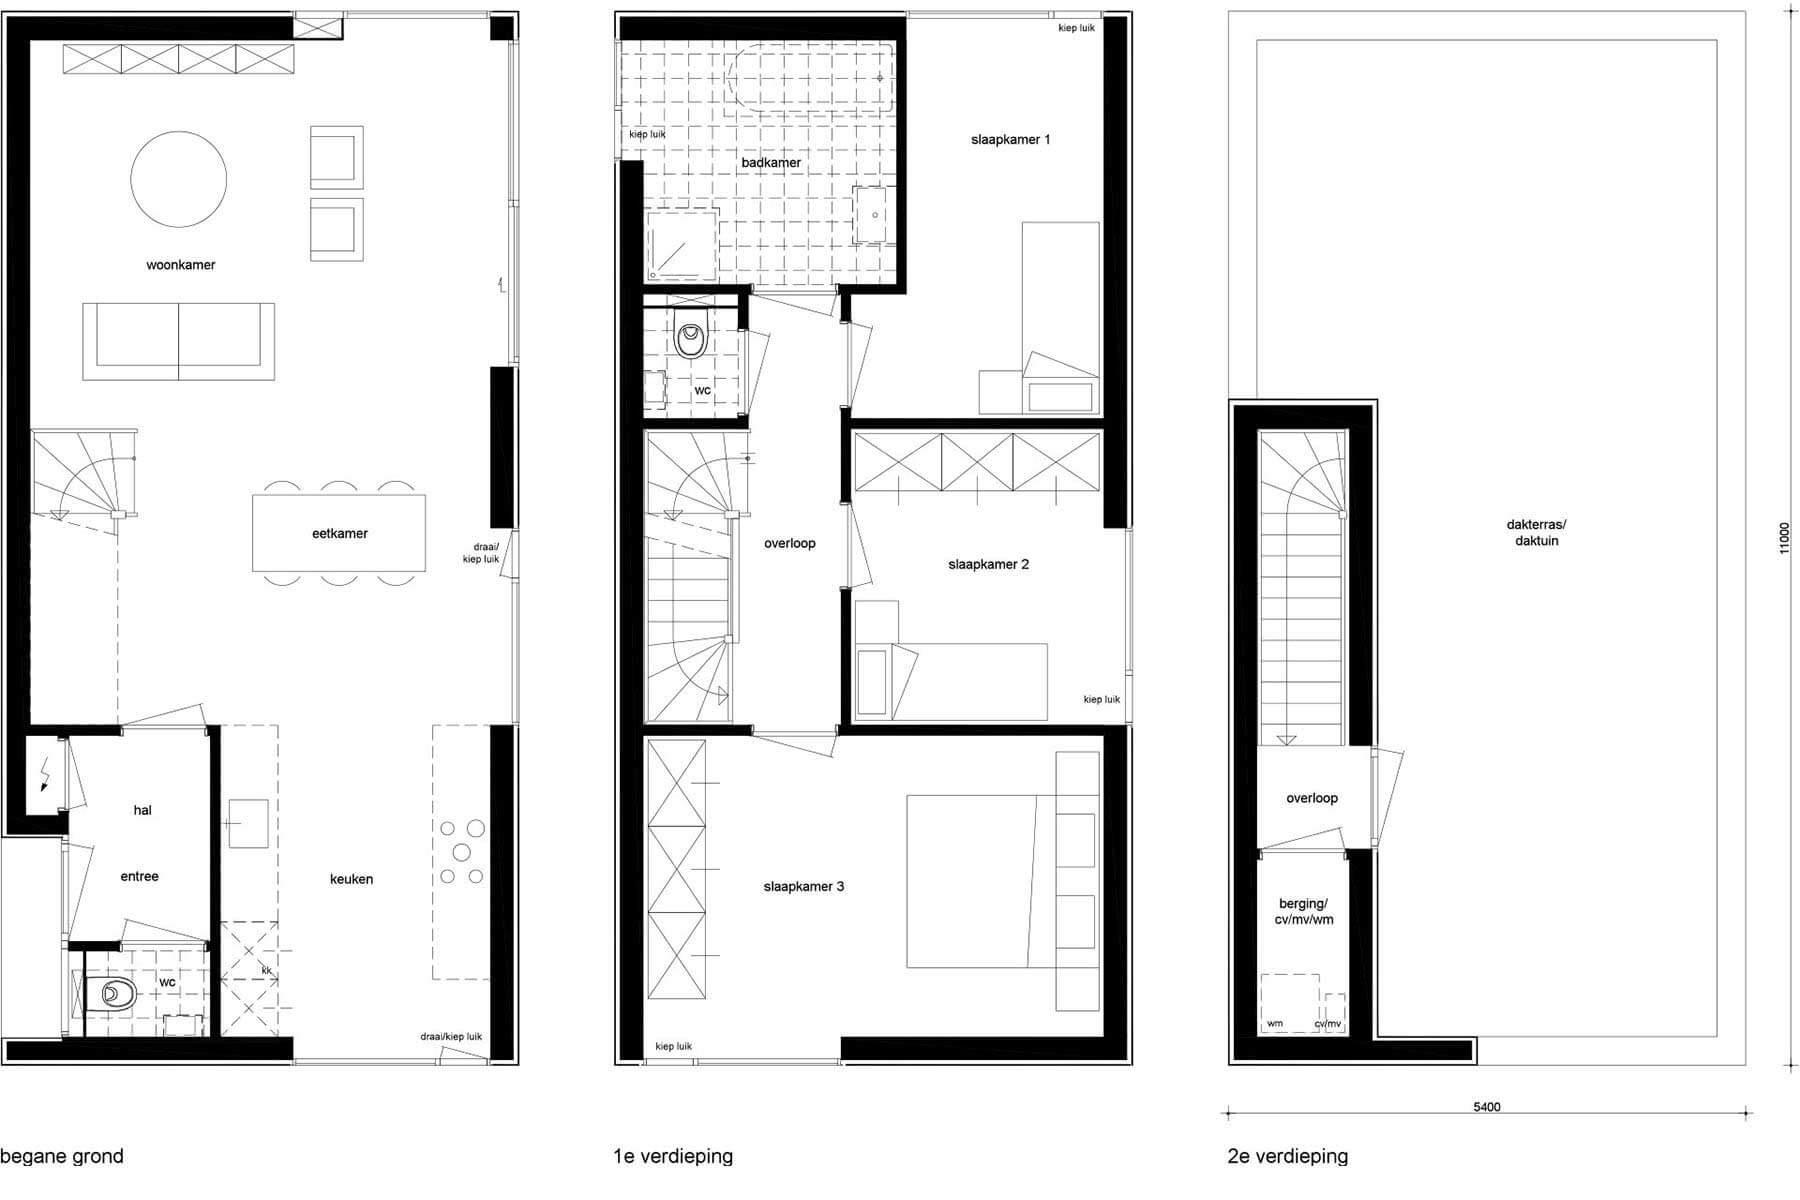 8A Architecten Zelfbouw woning Datcha house 3, Nijmegen (Lent)